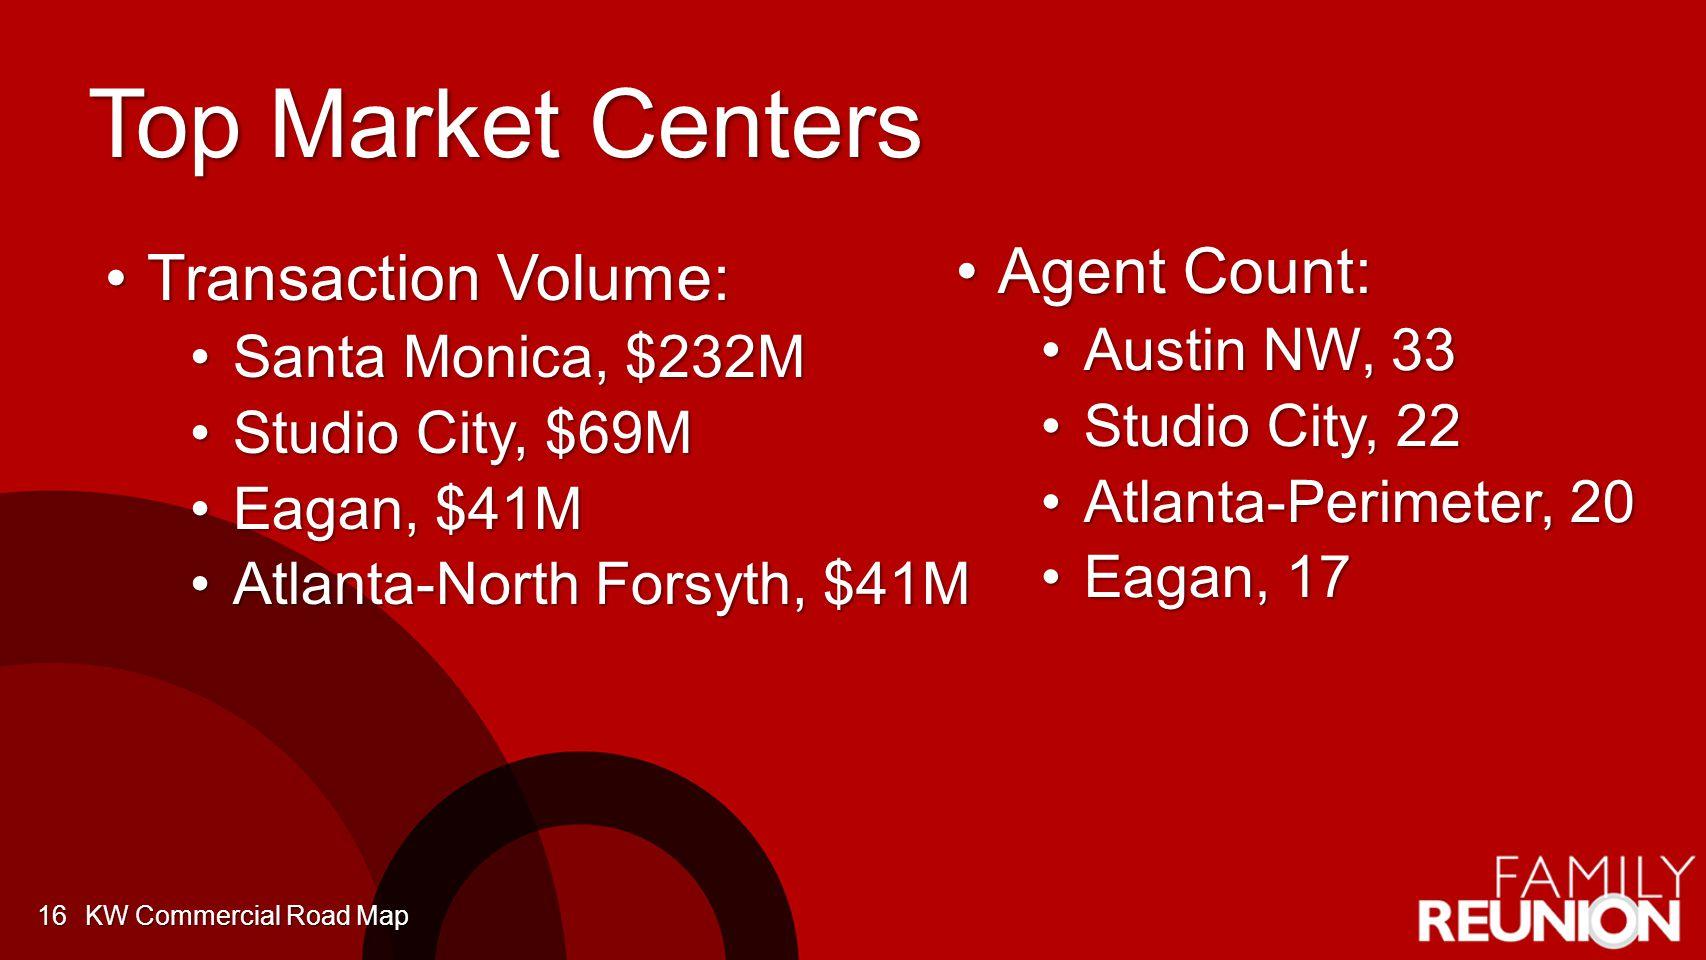 Top Market Centers Transaction Volume:Transaction Volume: Santa Monica, $232MSanta Monica, $232M Studio City, $69MStudio City, $69M Eagan, $41MEagan, $41M Atlanta-North Forsyth, $41MAtlanta-North Forsyth, $41M KW Commercial Road Map16 Agent Count:Agent Count: Austin NW, 33Austin NW, 33 Studio City, 22Studio City, 22 Atlanta-Perimeter, 20Atlanta-Perimeter, 20 Eagan, 17Eagan, 17